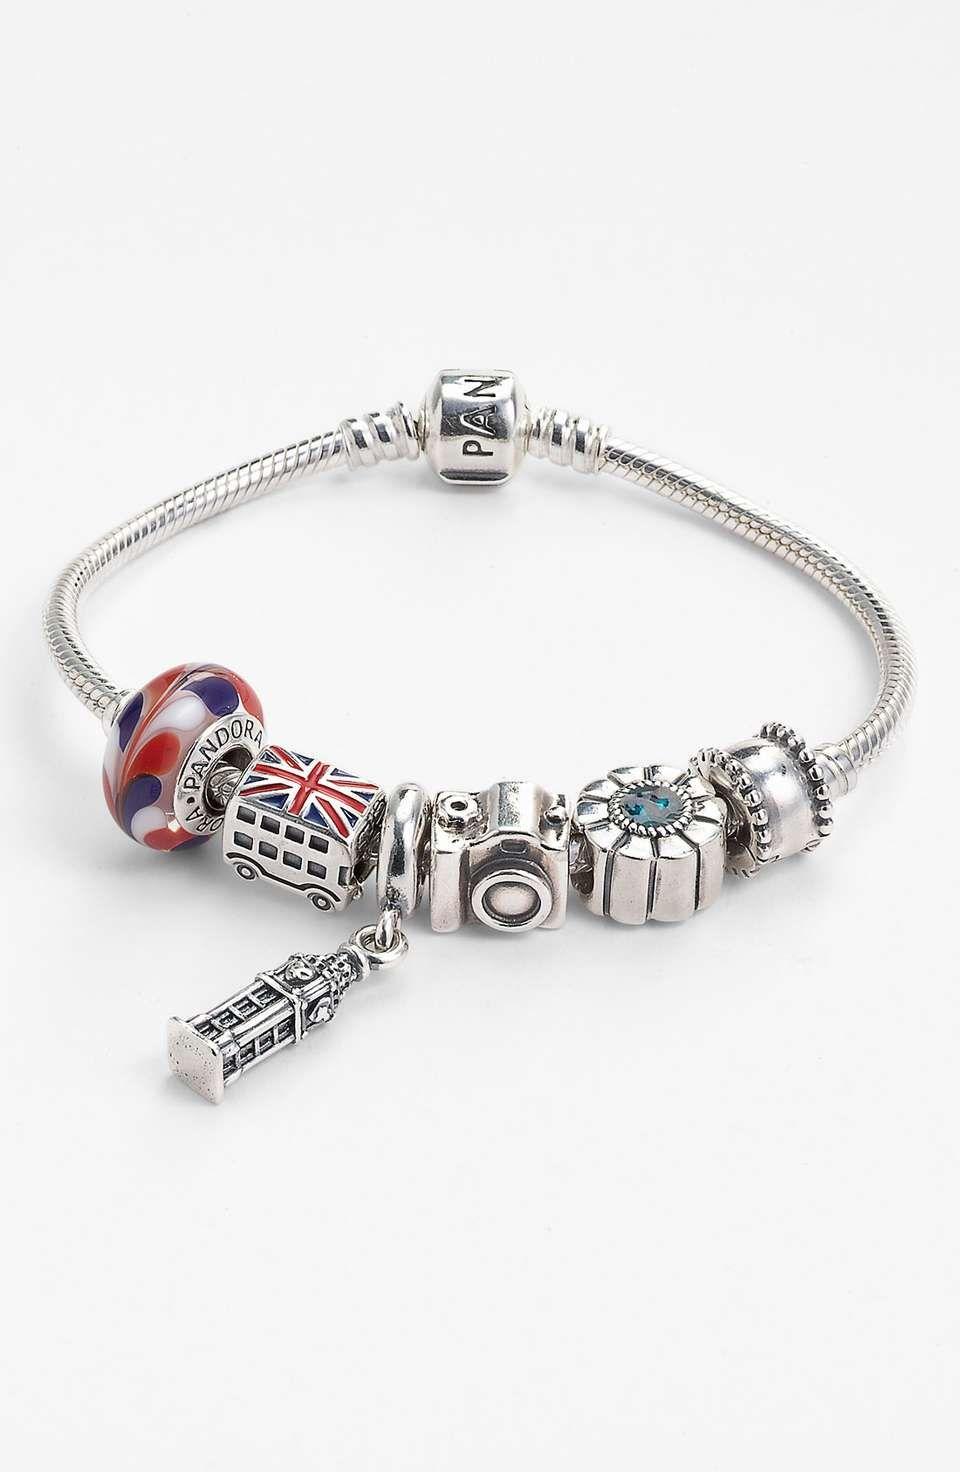 PANDORA London Bus Bead Charm #womens #london-bus-bead #charm #sterling-silver #wantering